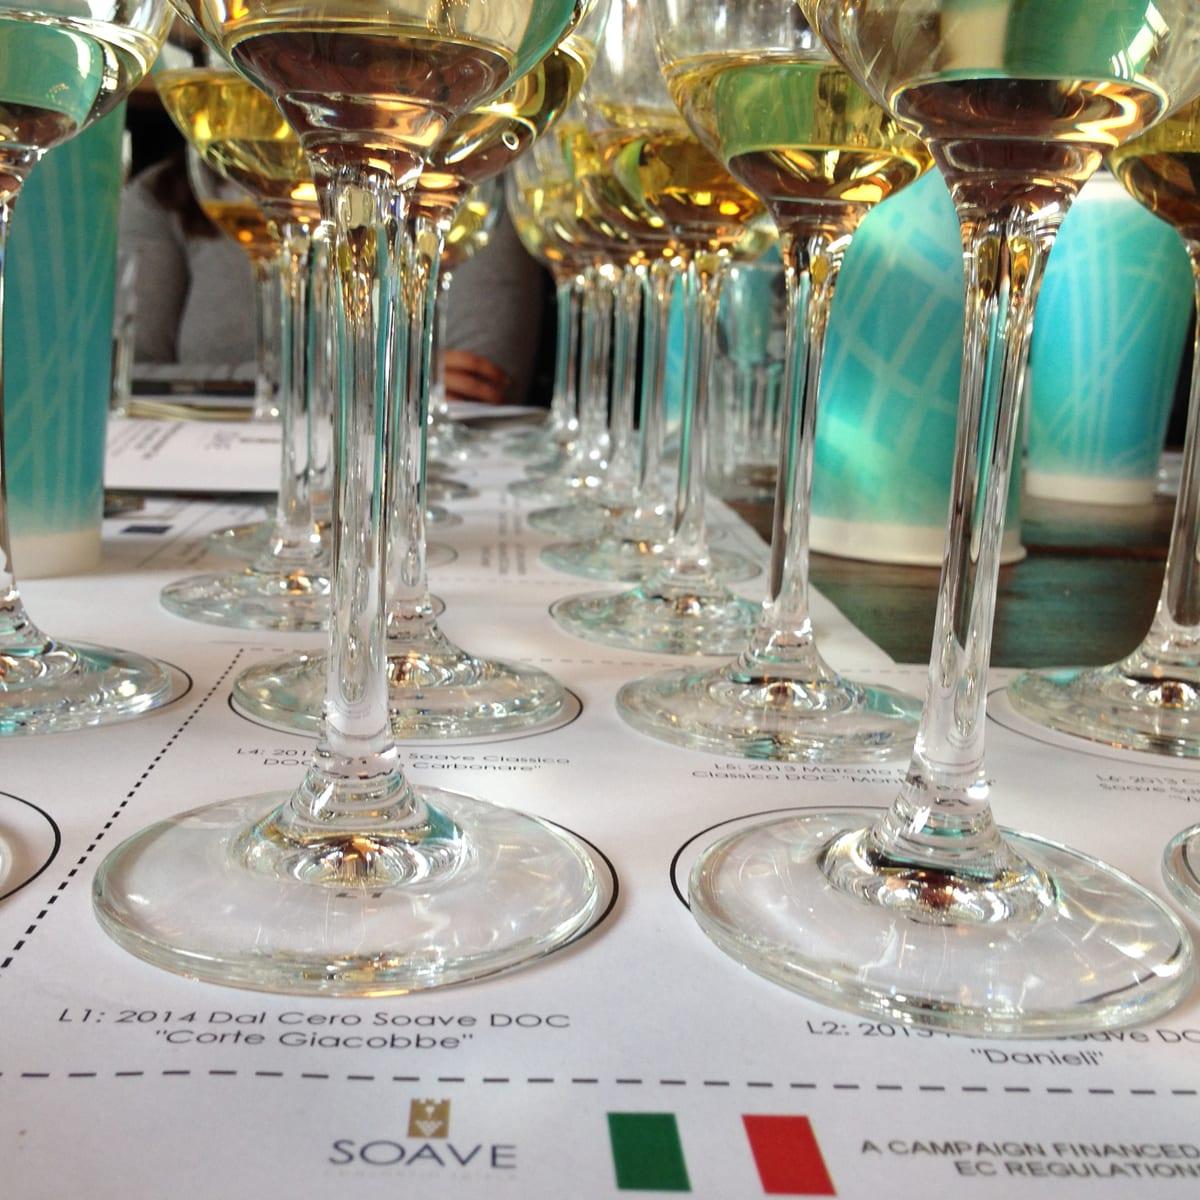 Soave Italian white wine